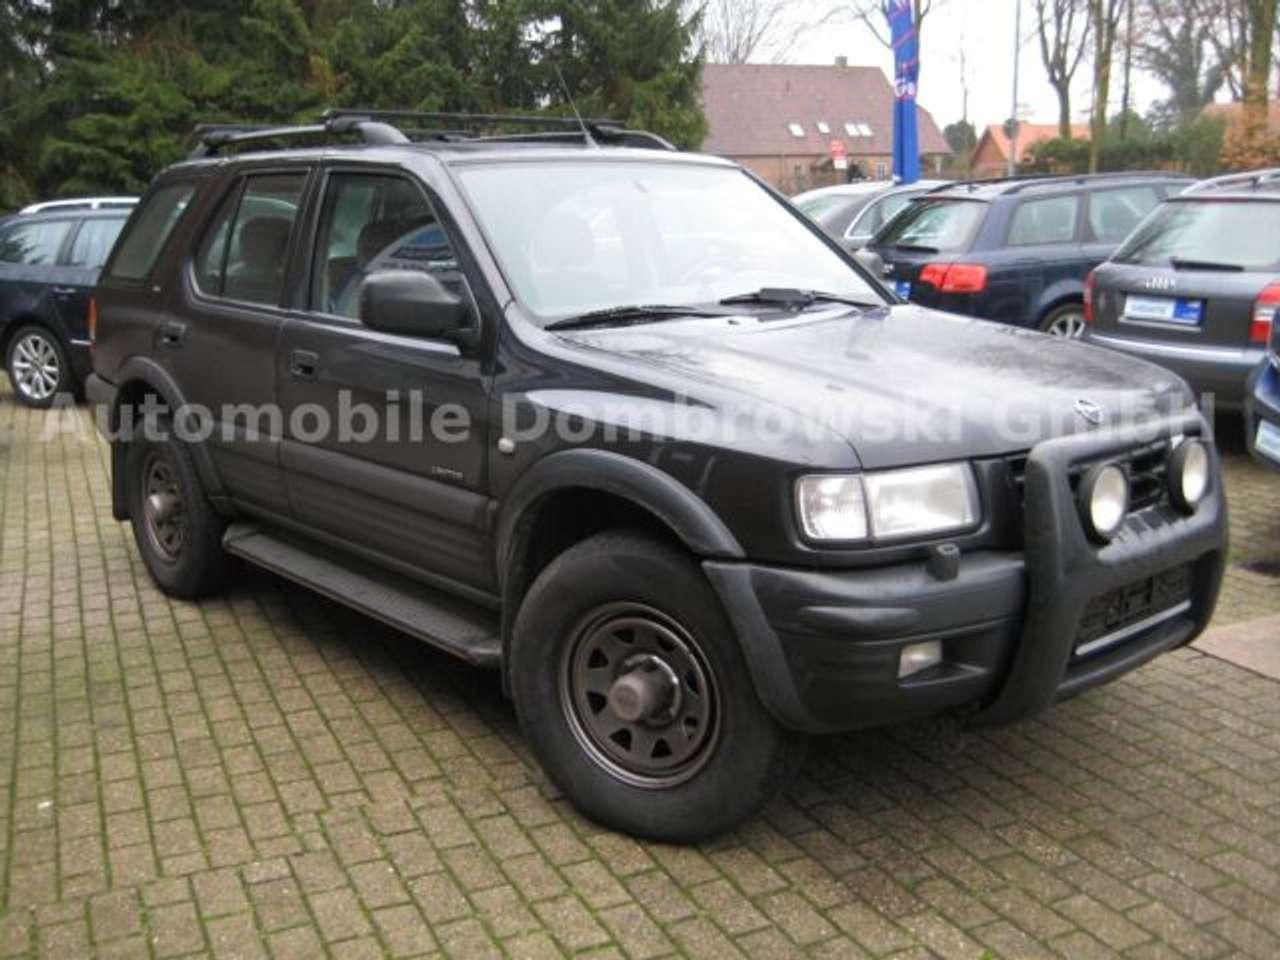 Autos nach Opel Frontera 3.2 V6